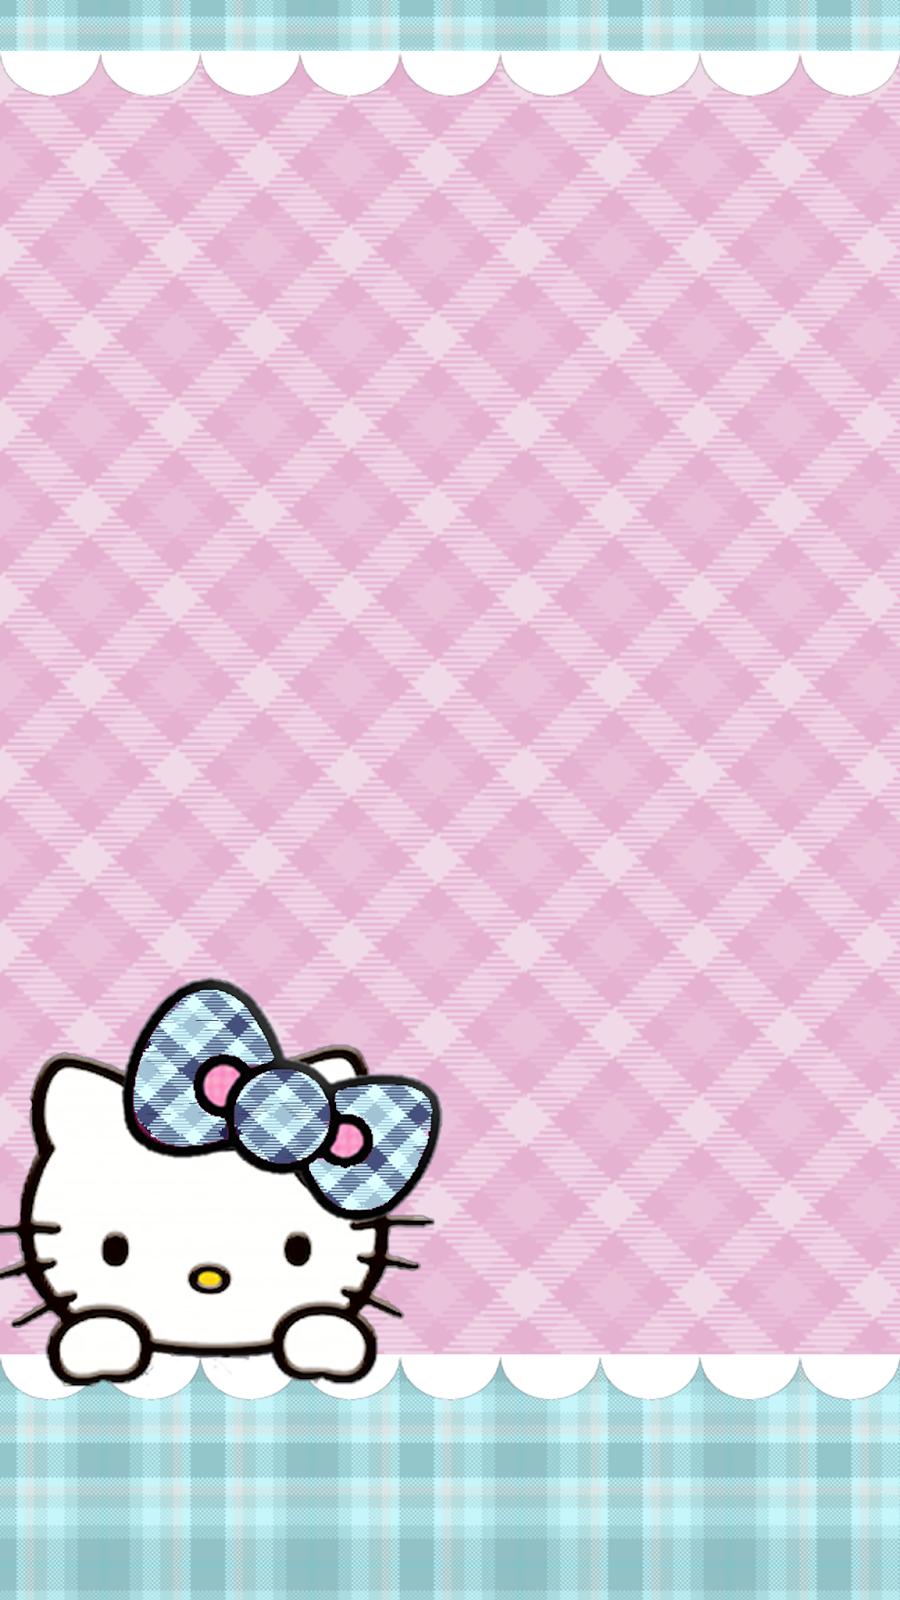 ... Phone Wallpapers ~ | Pinterest | Hello Kitty, Kitty and Sanrio